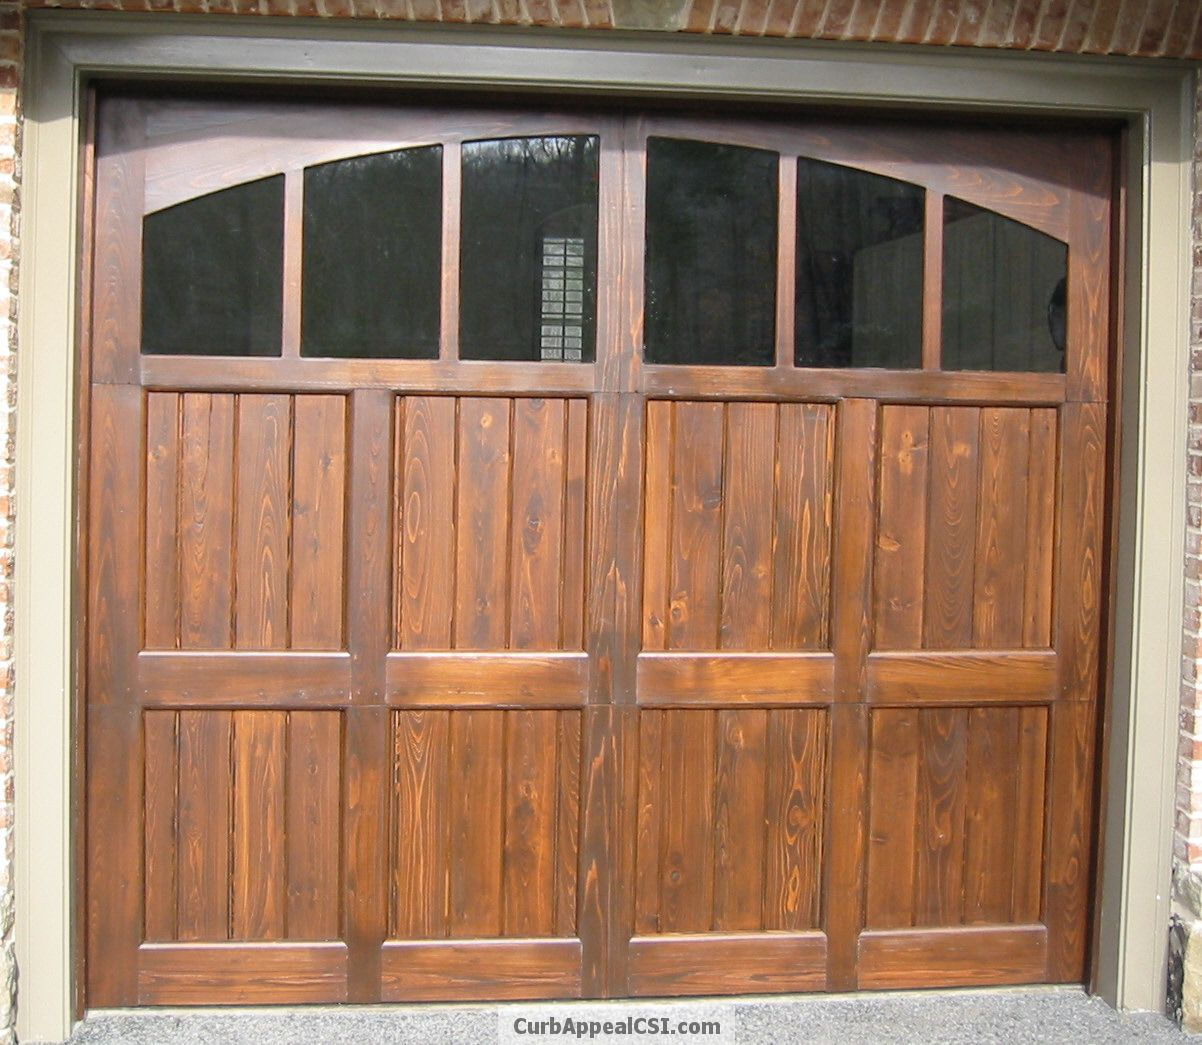 Craftsman style garage doors - Images Of Garage Doors Pictures Of Garage Doors Installed In The Metro Atlanta Area